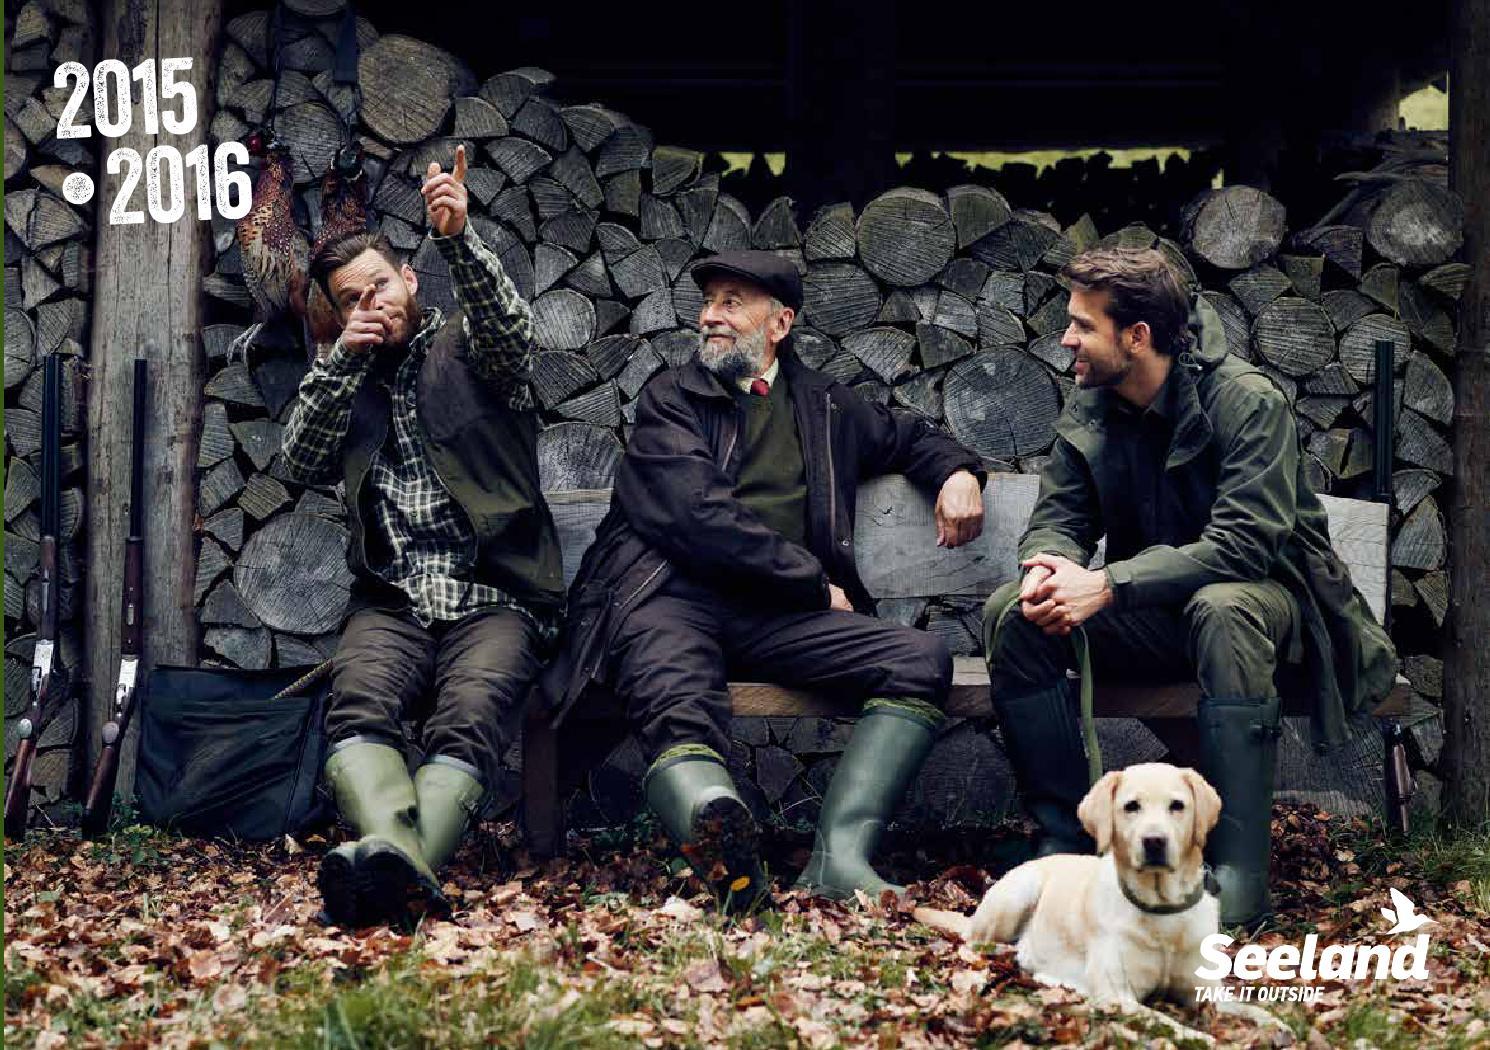 Seeland Crieff Treggings//TREKKINGS